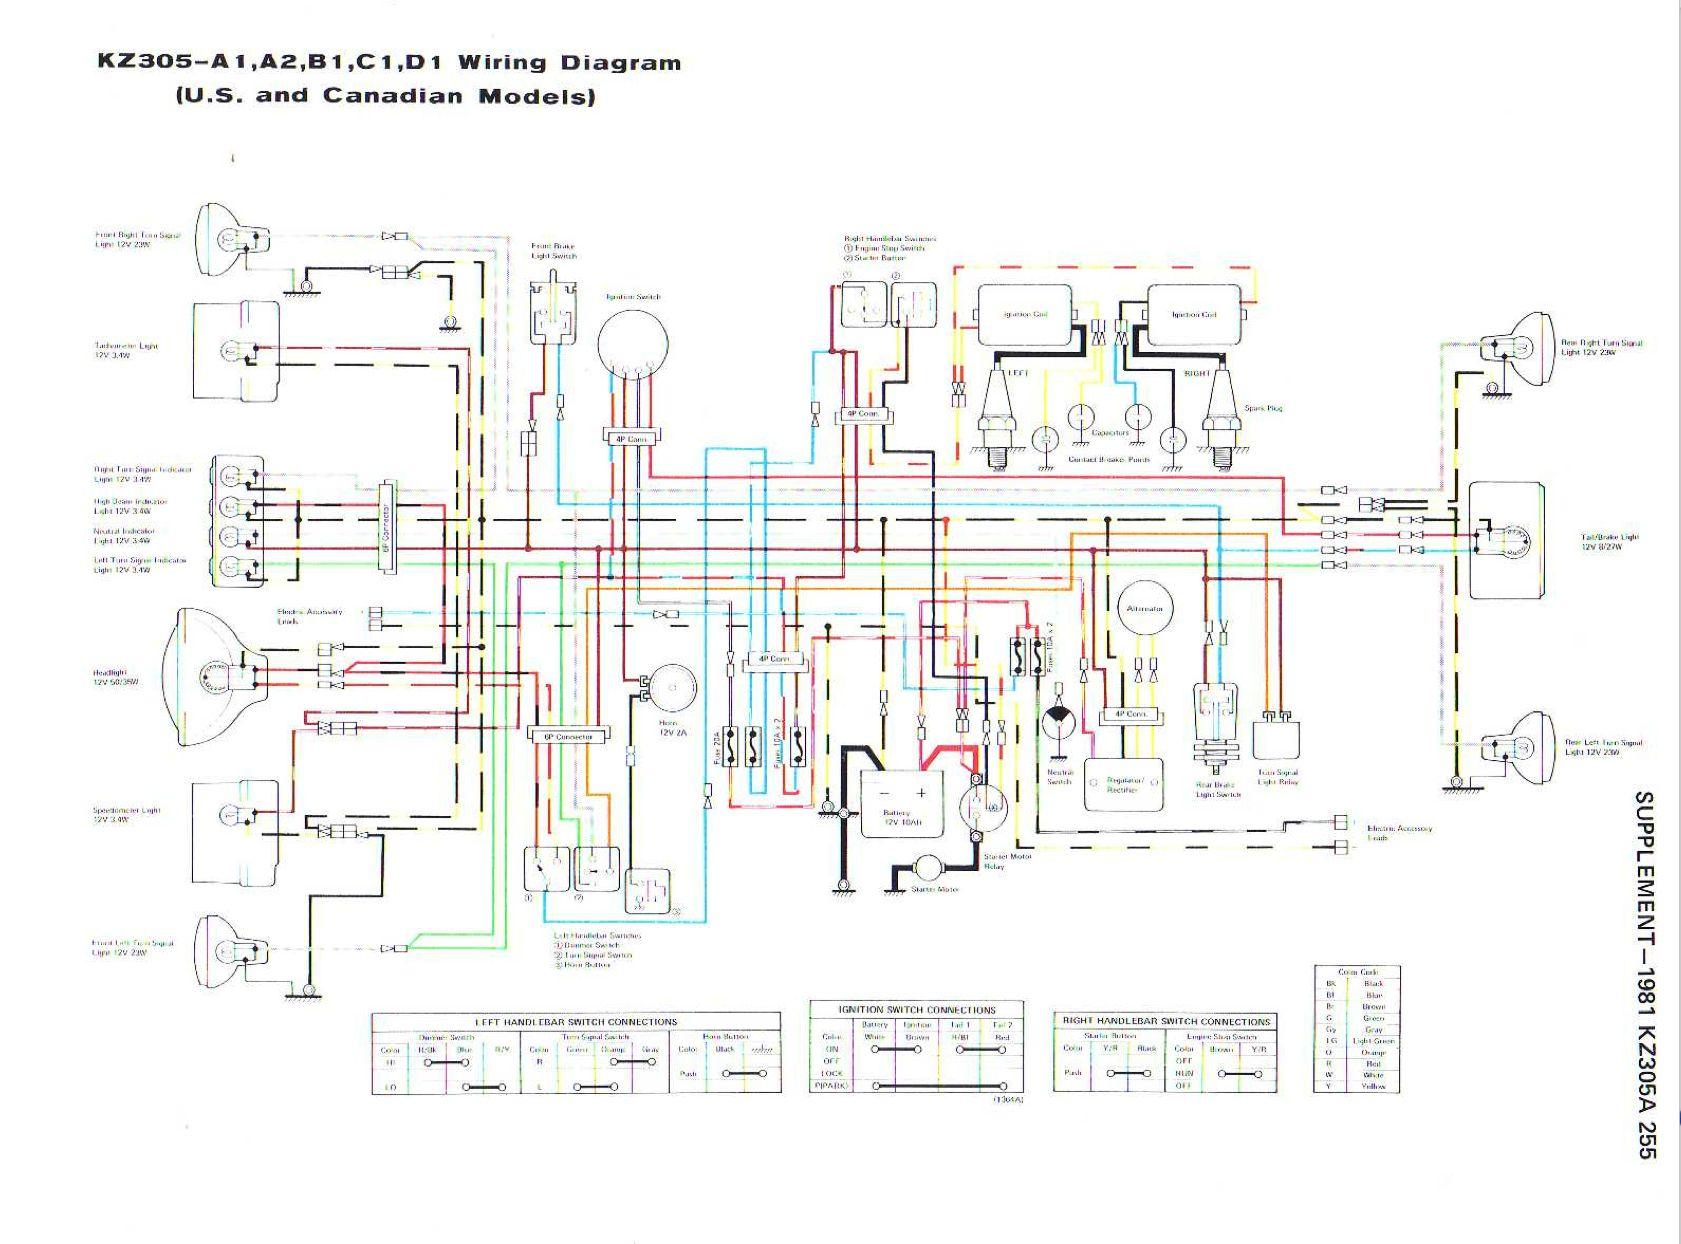 [QNCB_7524]  OK_1802] Kz1300 Ignition Wiring Diagram Get Free Image About Wiring Diagram  Free Diagram | Kz1300 Wiring Diagram |  | Romet Aidew Illuminateatx Librar Wiring 101